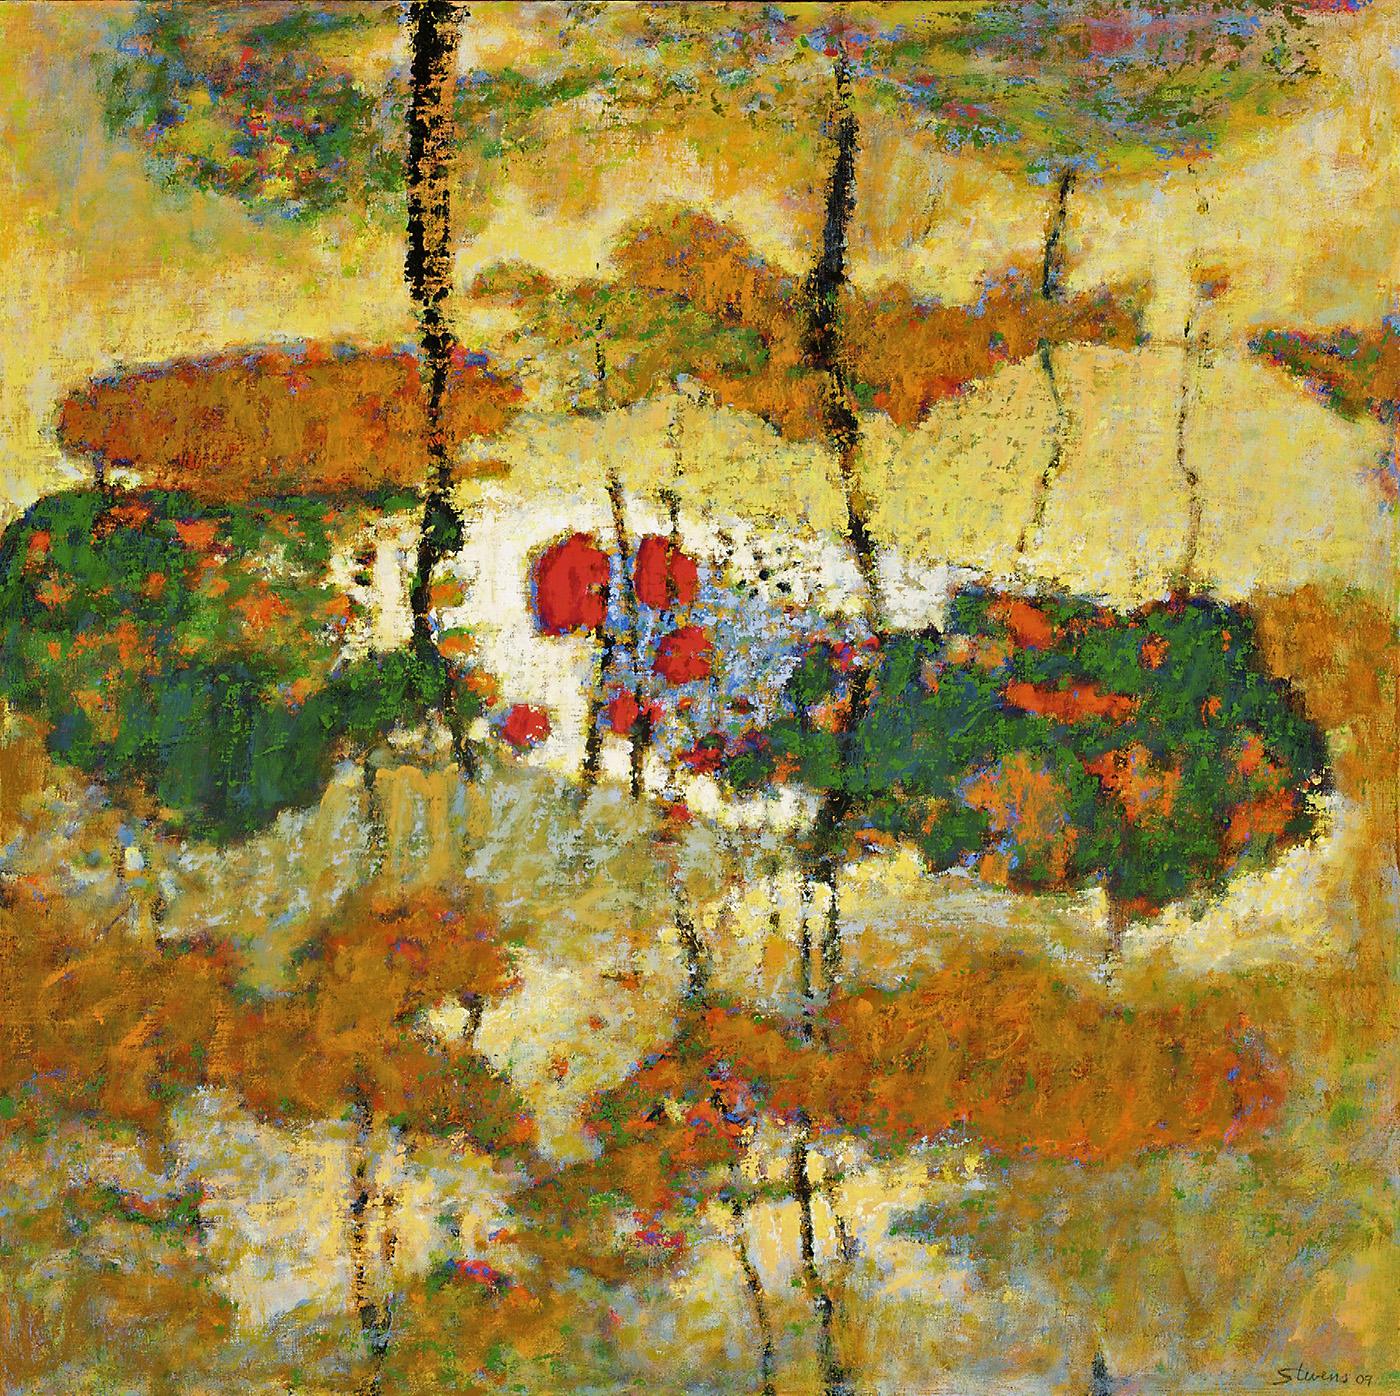 "Spoken Like a Melody   oil on canvas   30 x 30""   2009"